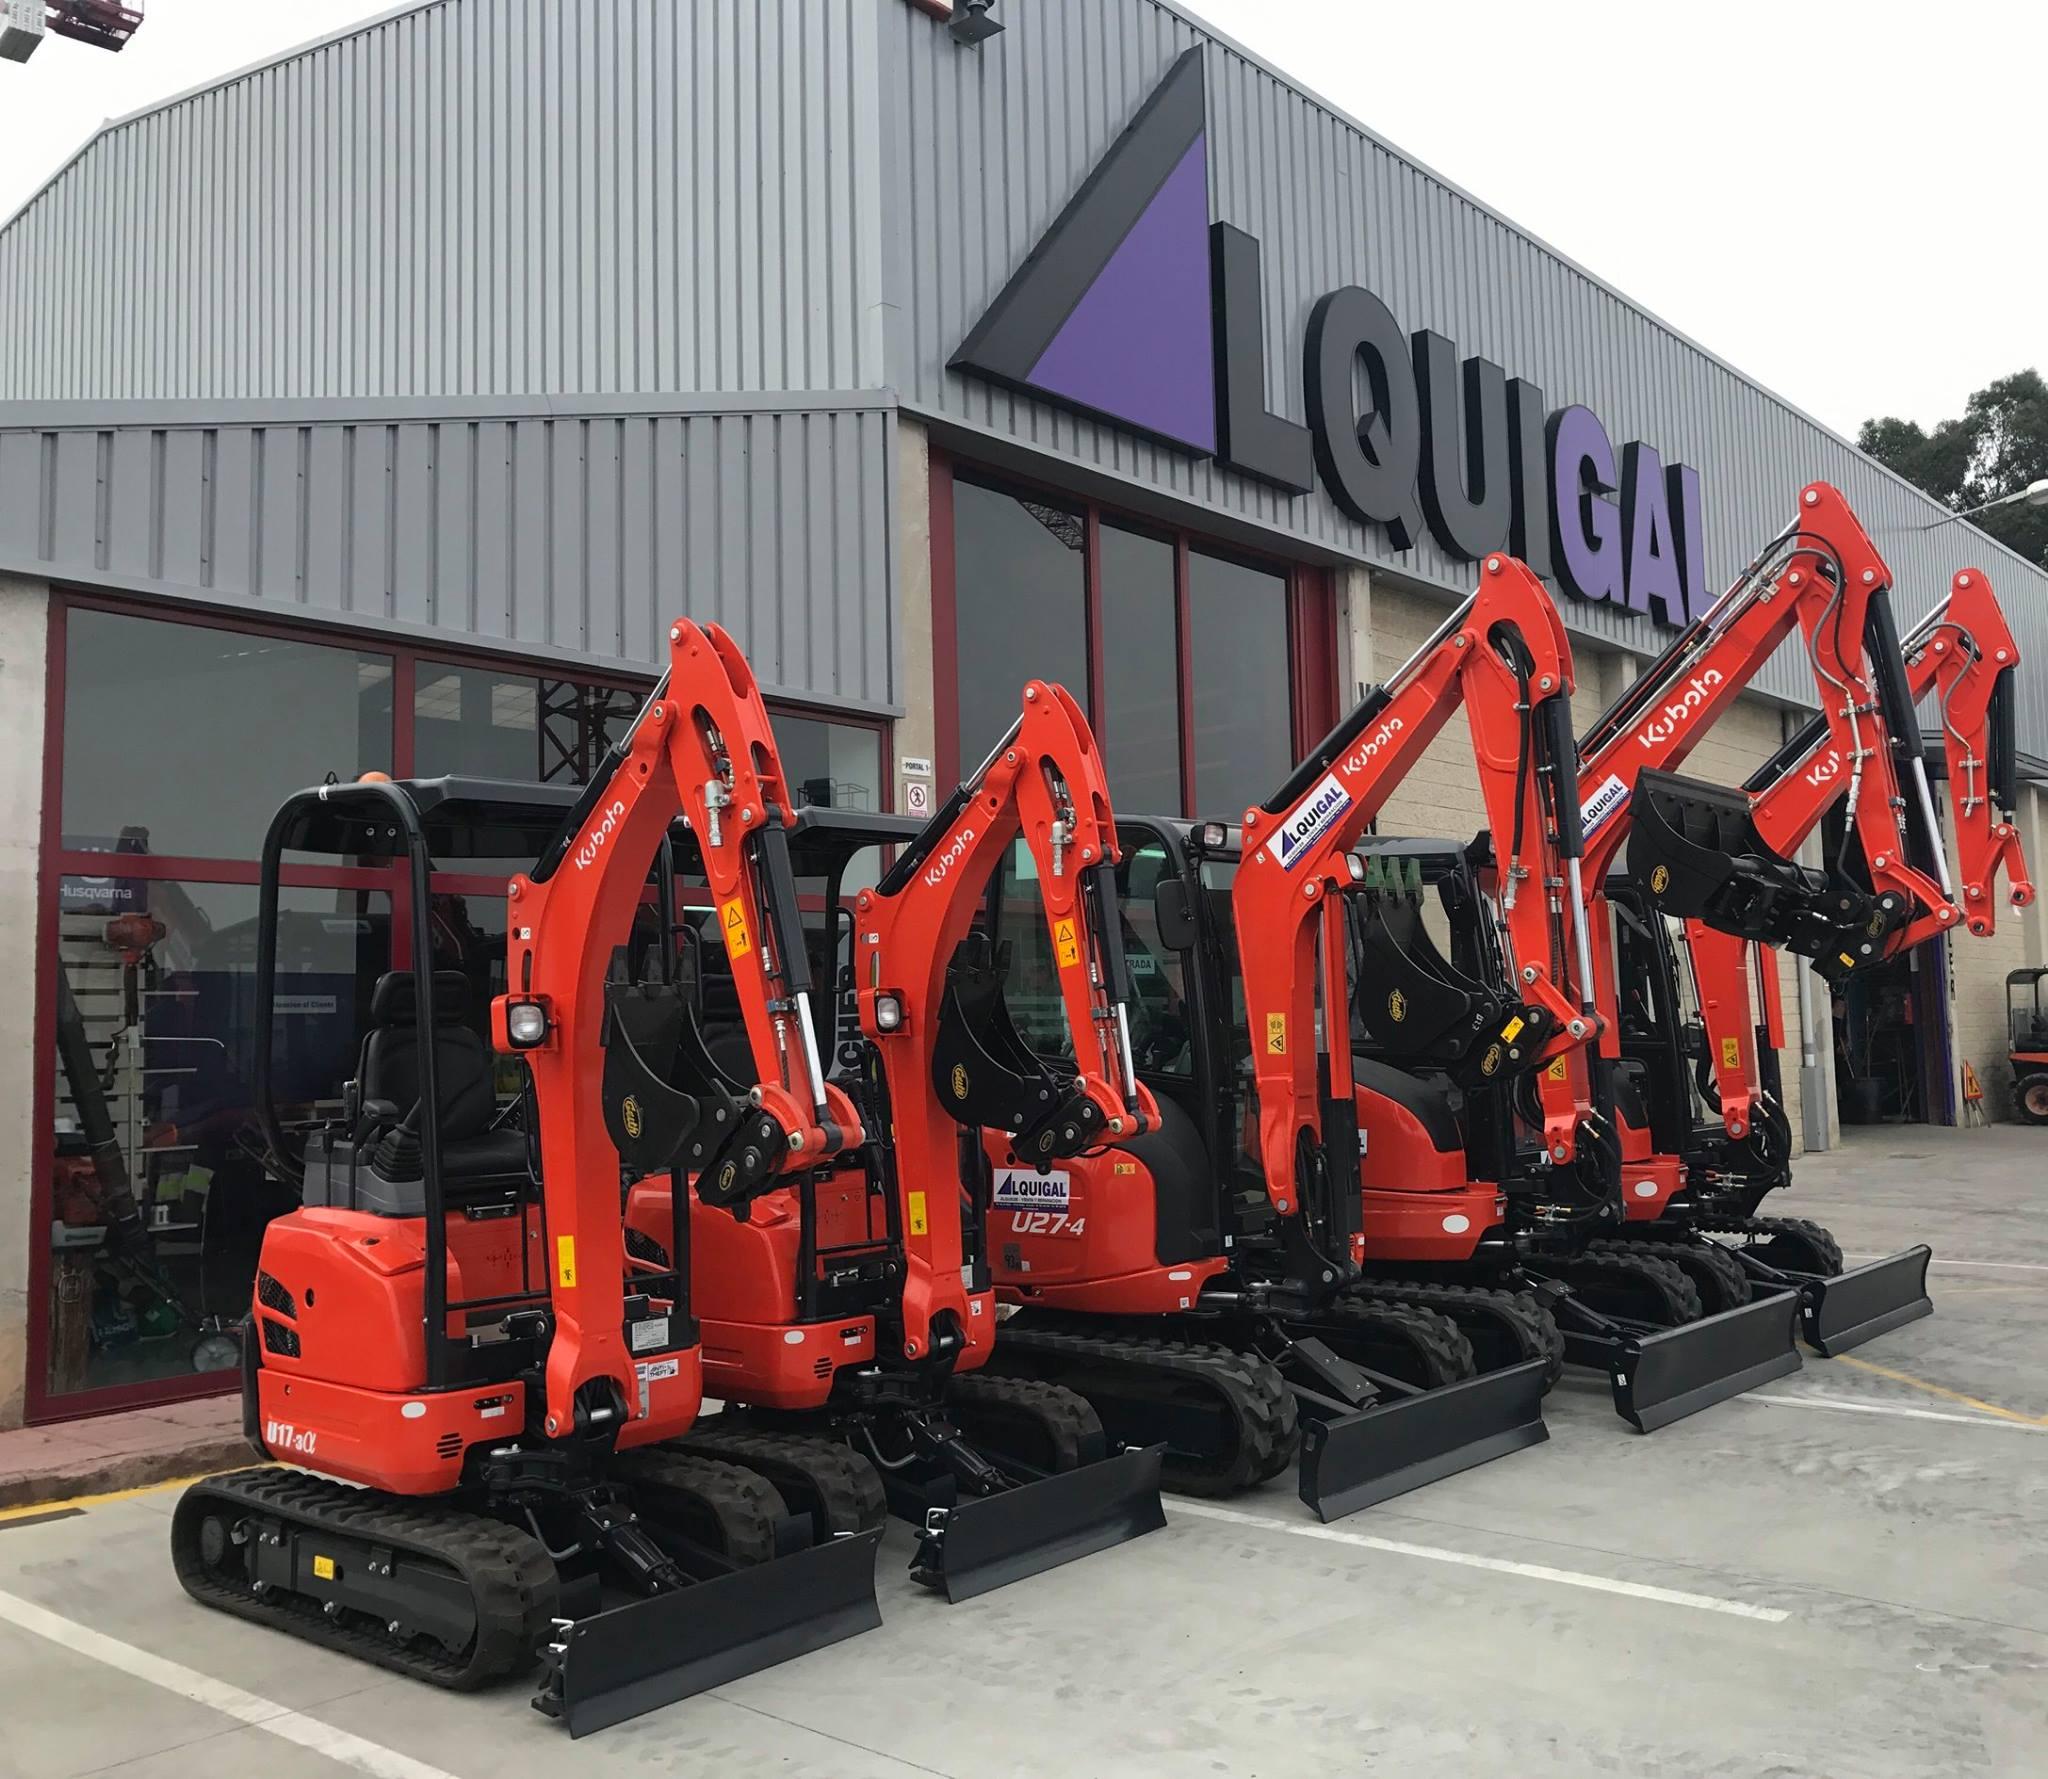 kubota geith plant hire